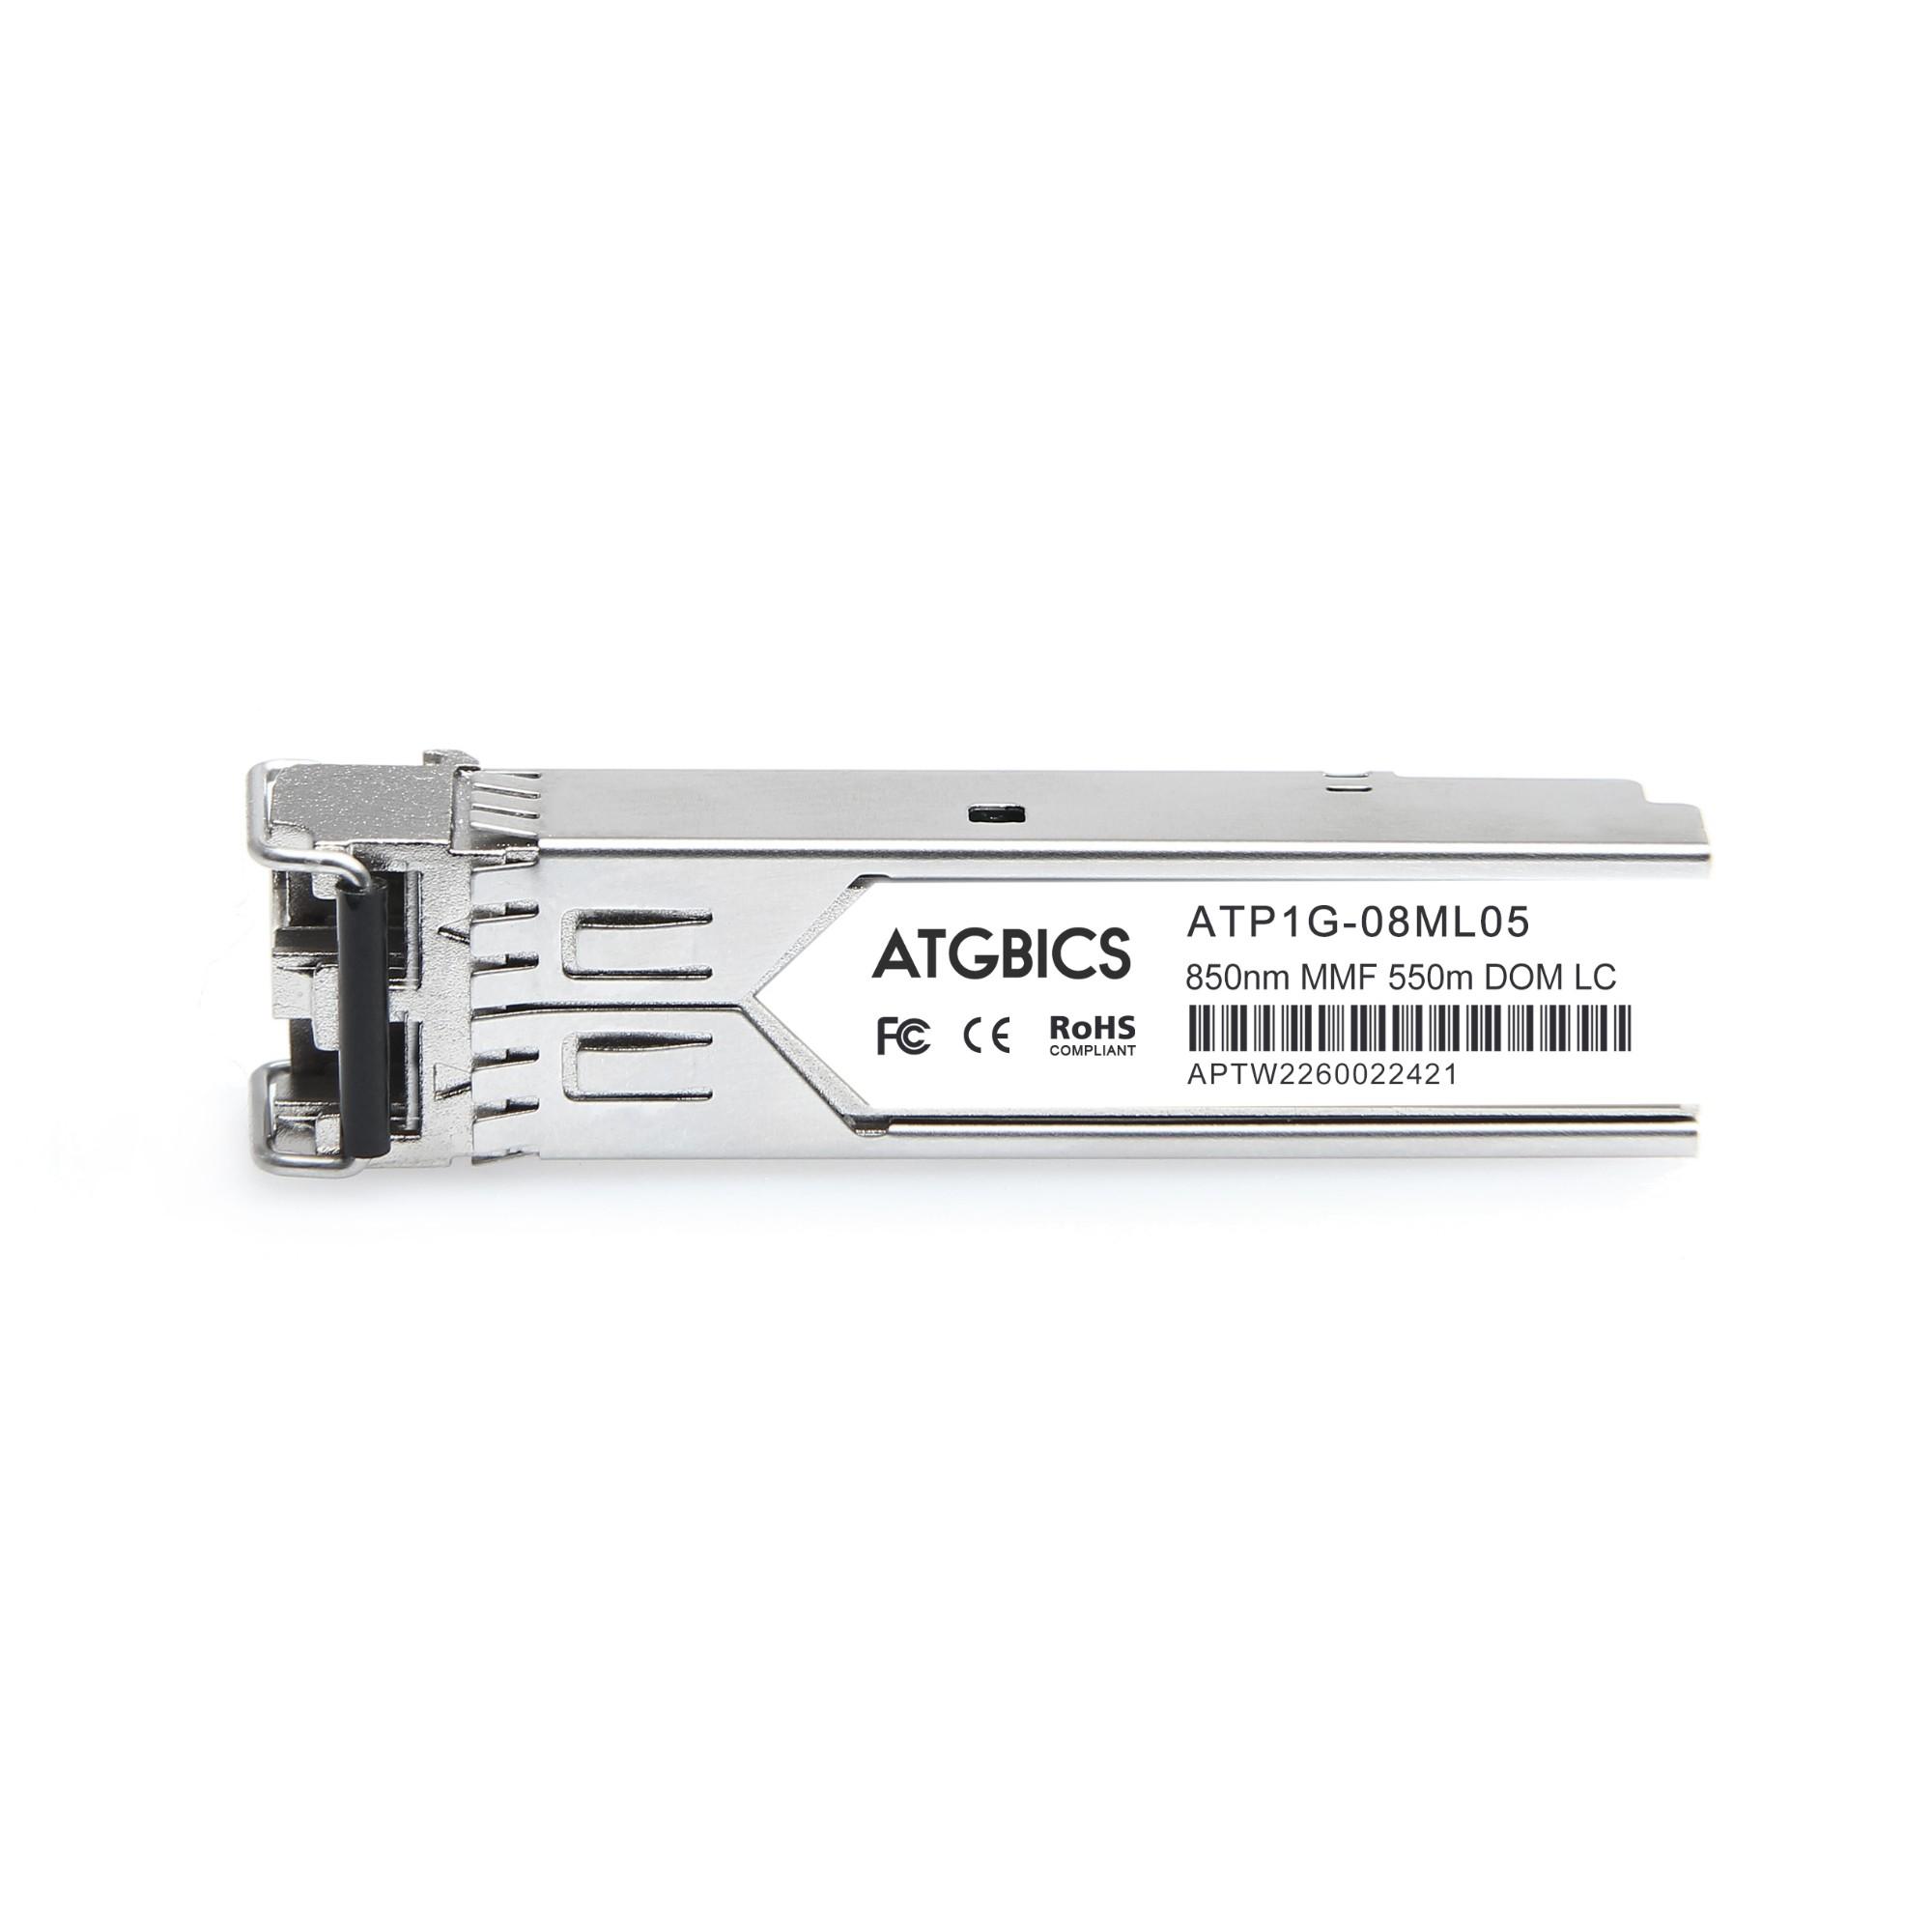 Image of ATGBICS ET4202-SX-C network transceiver module Fiber optic 1000 Mbit/s SFP 850 nm